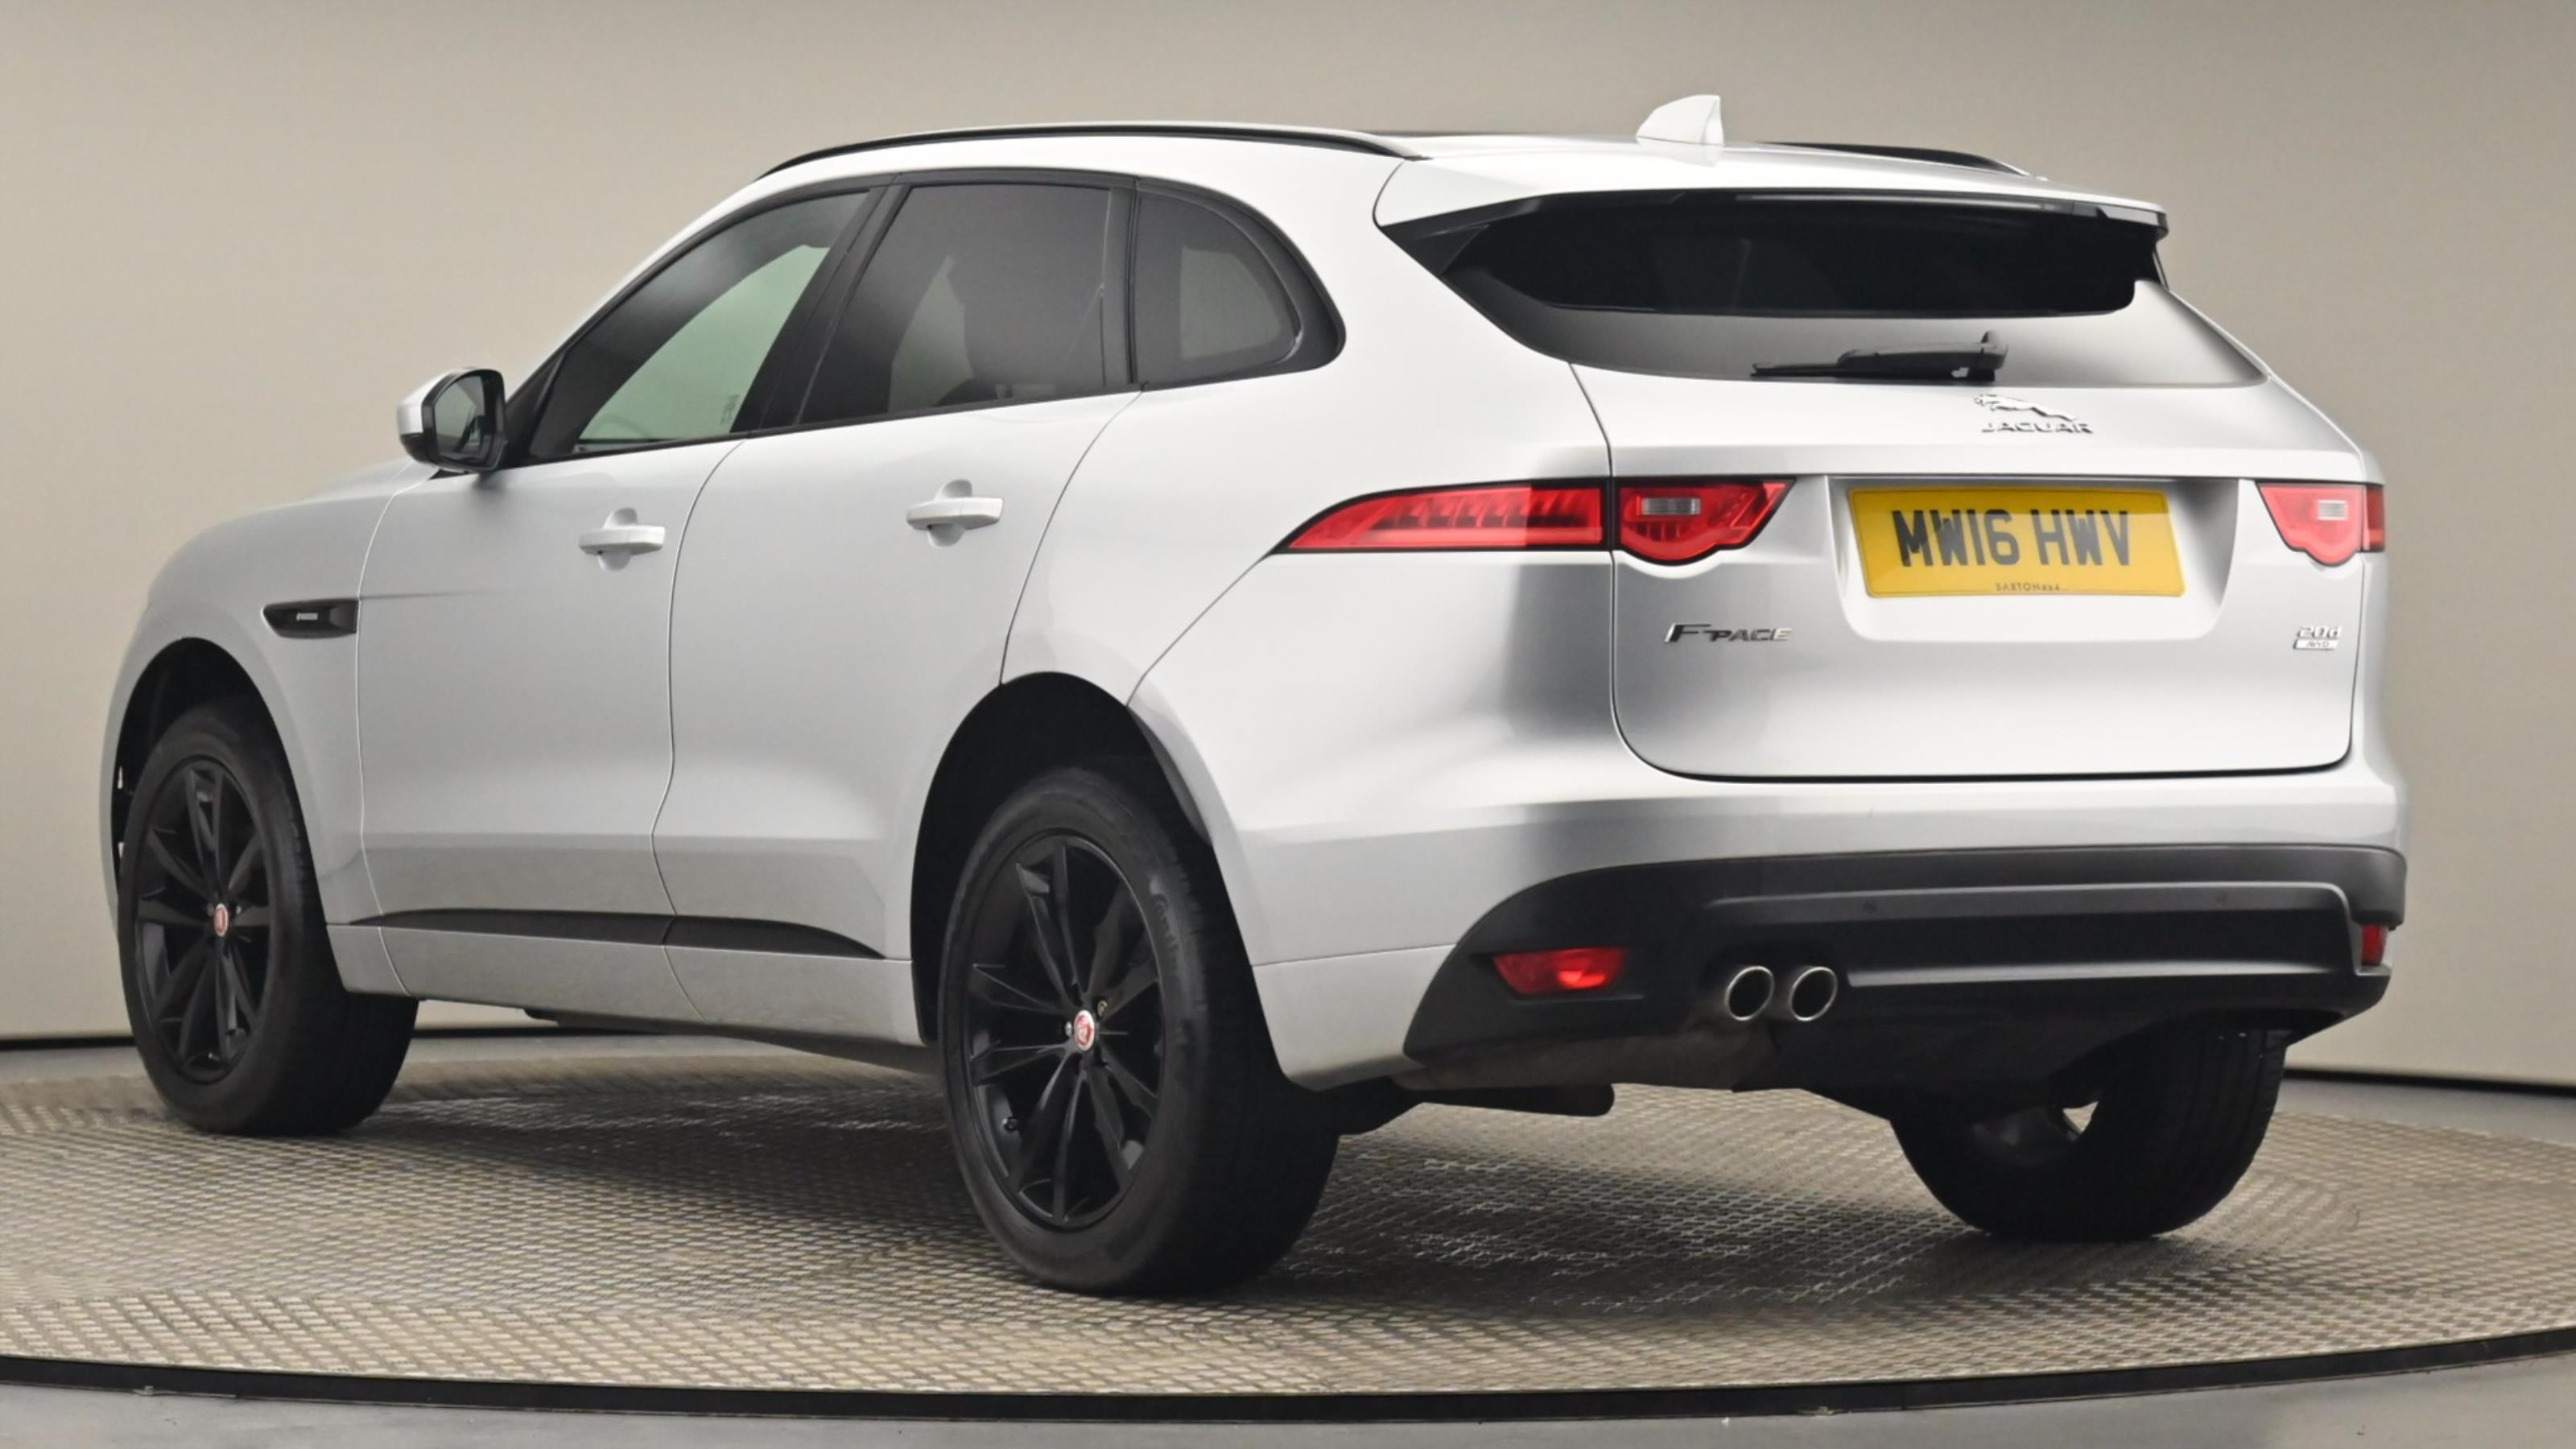 Used 2016 Jaguar F-PACE 2.0d R-Sport 5dr Auto AWD SILVER at Saxton4x4